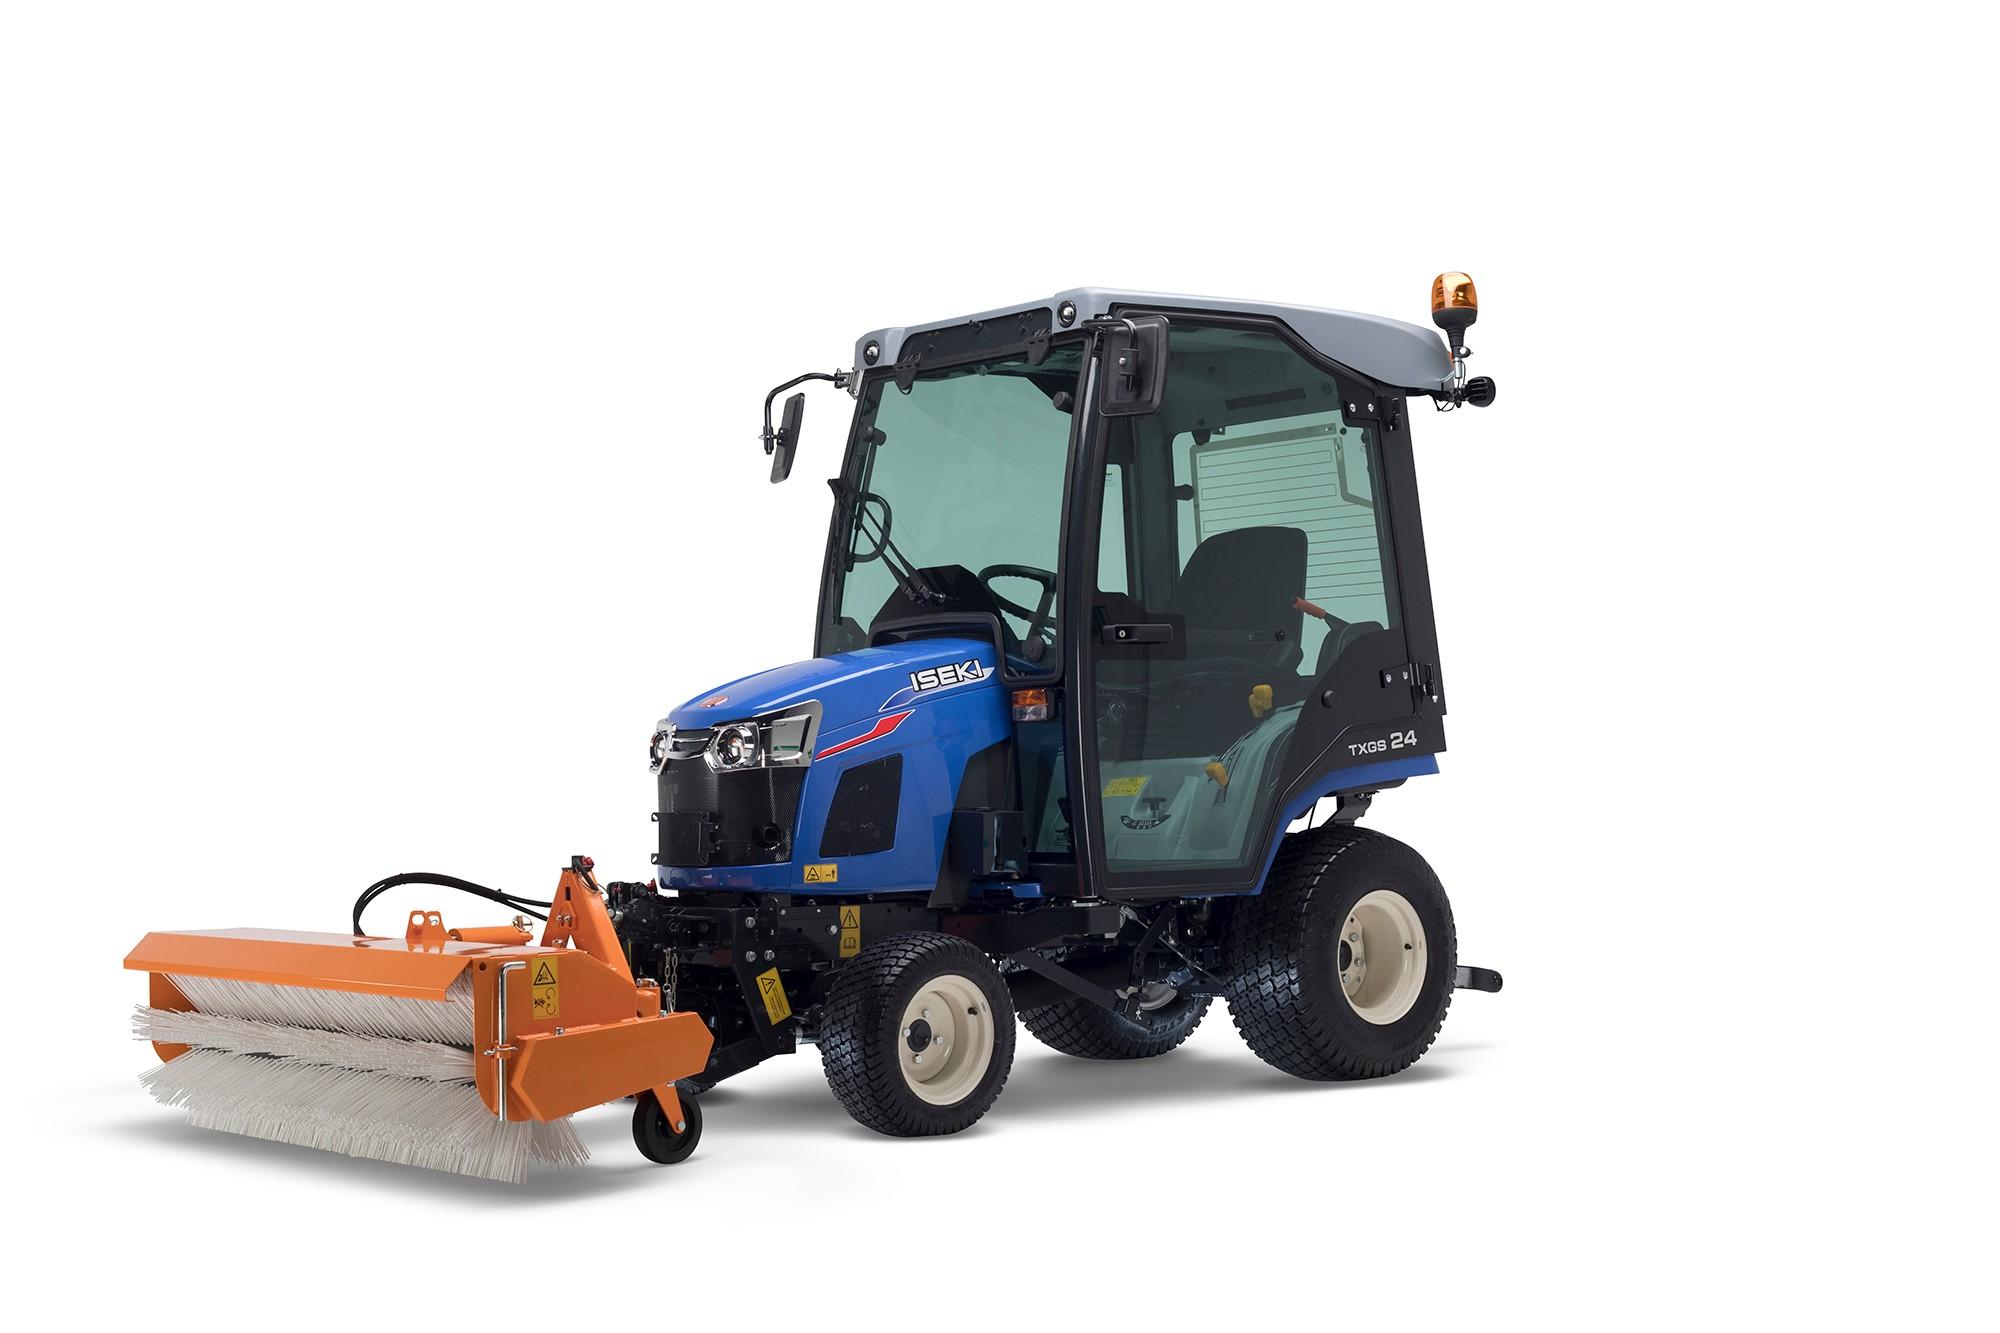 Kompaktní malotraktor Iseki TXGS 24